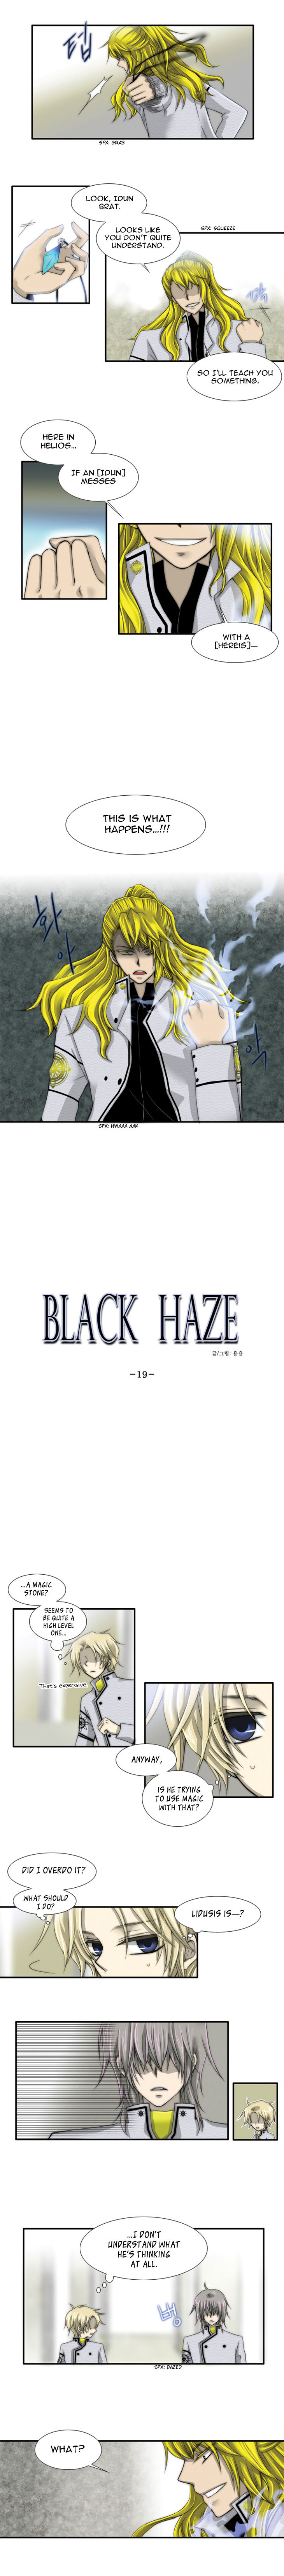 Black Haze 19 Page 2